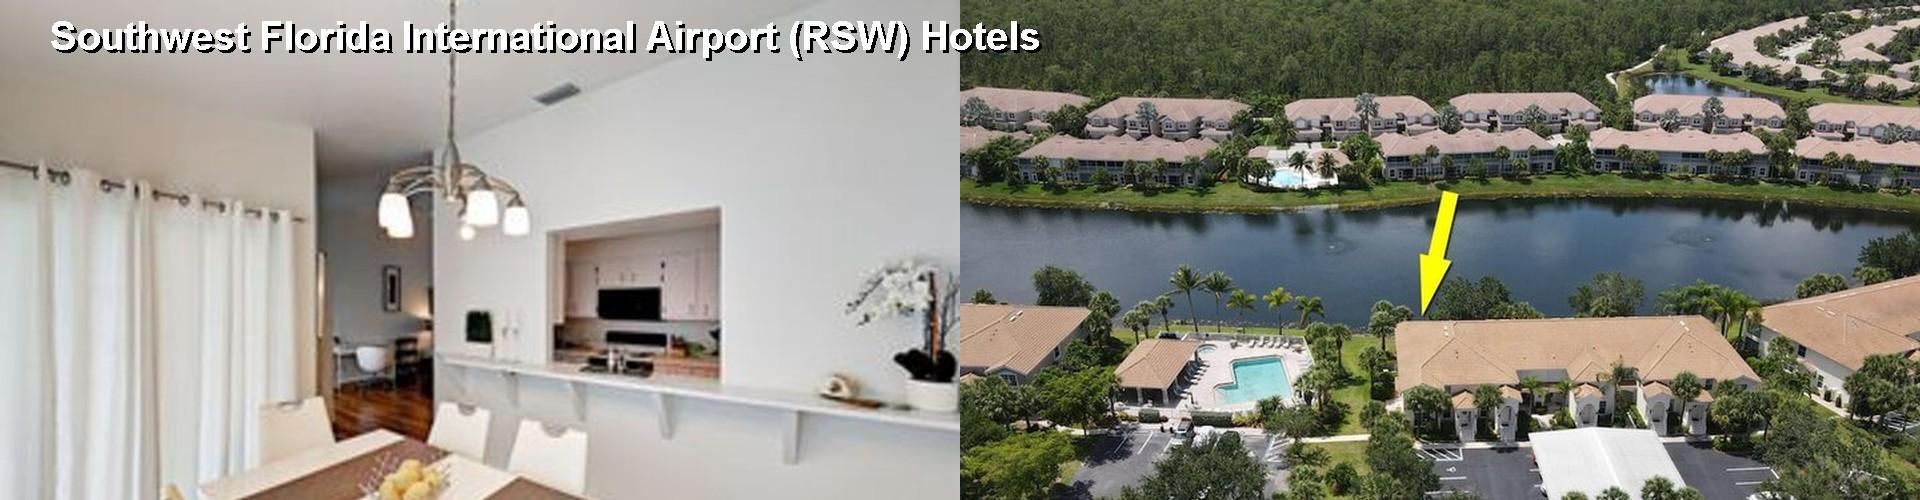 5 Best Hotels Near Southwest Florida International Airport Rsw